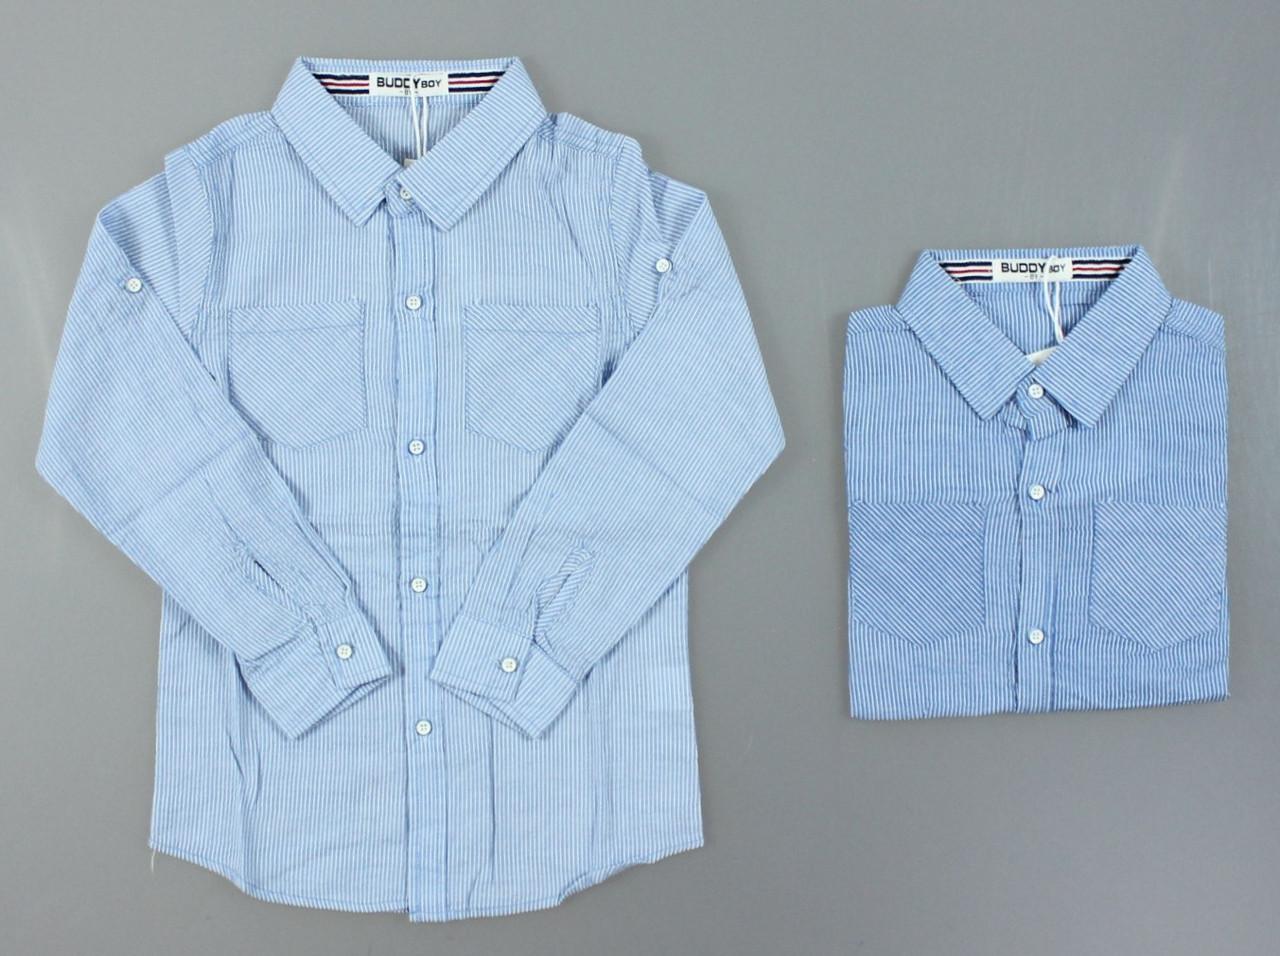 {есть:10 лет,12 лет,14 лет,16 лет,8 лет} Рубашка для мальчиков Buddy Boy, Артикул: 5736 [10 лет]